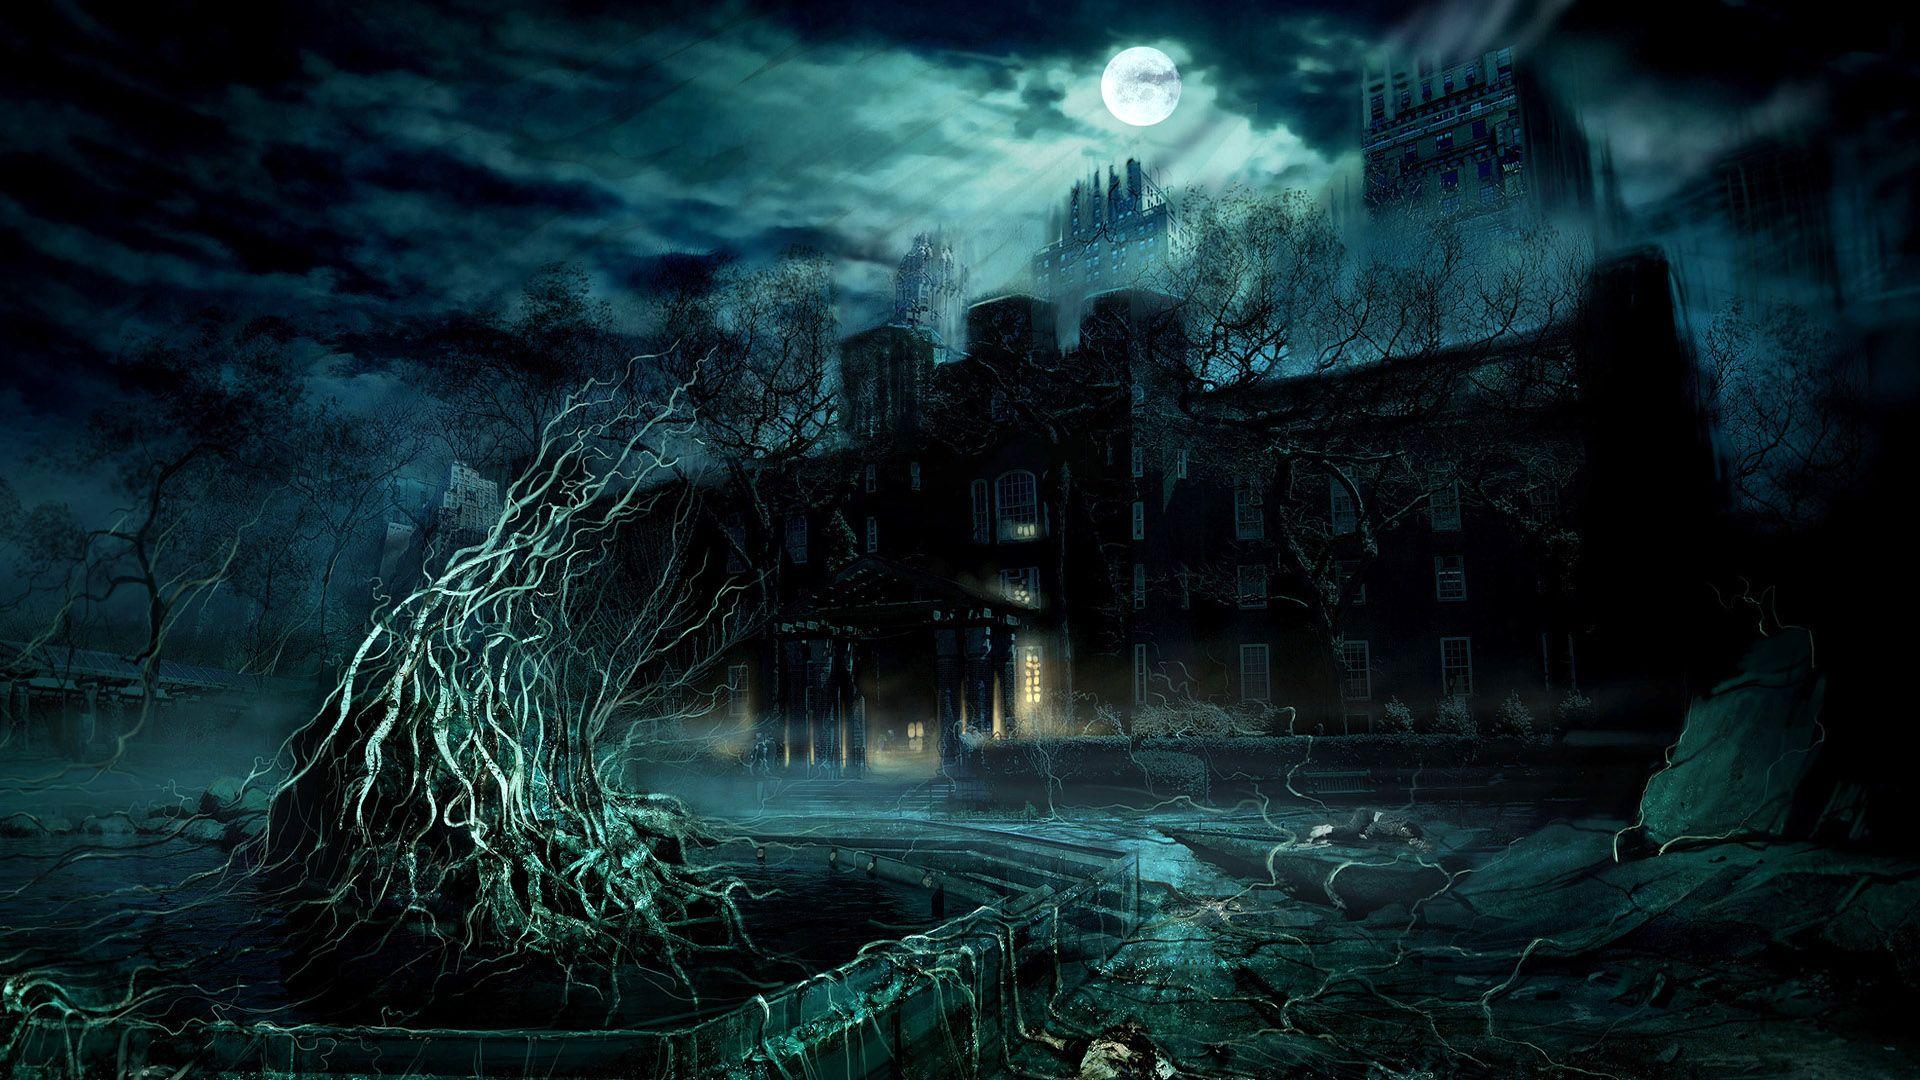 Gothic Dark Art 3D Fantasy Places HD picture nr 47797 1920x1080